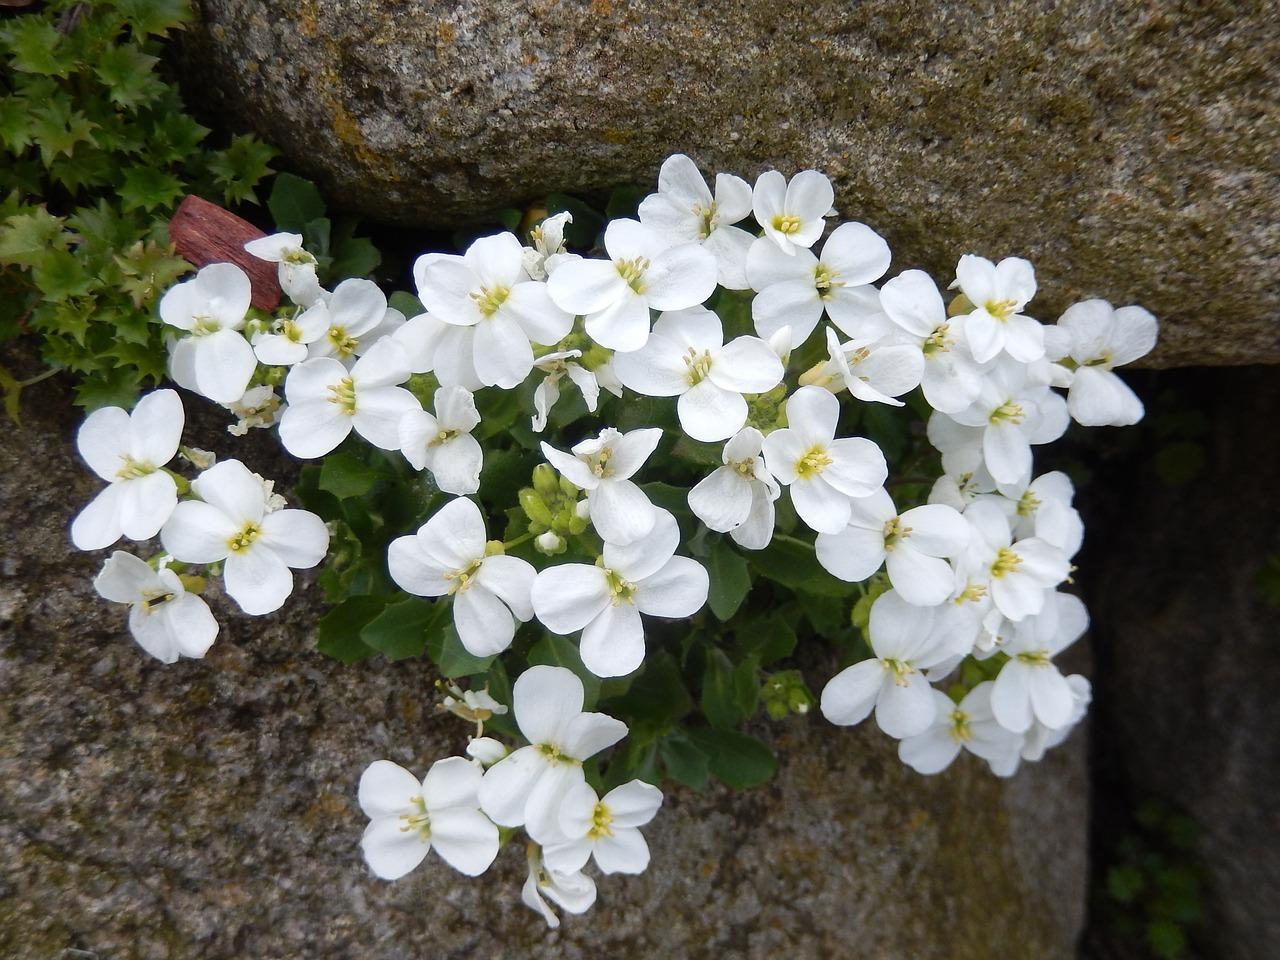 Stone Cropstone Gardenspringblossombloom Free Photo From